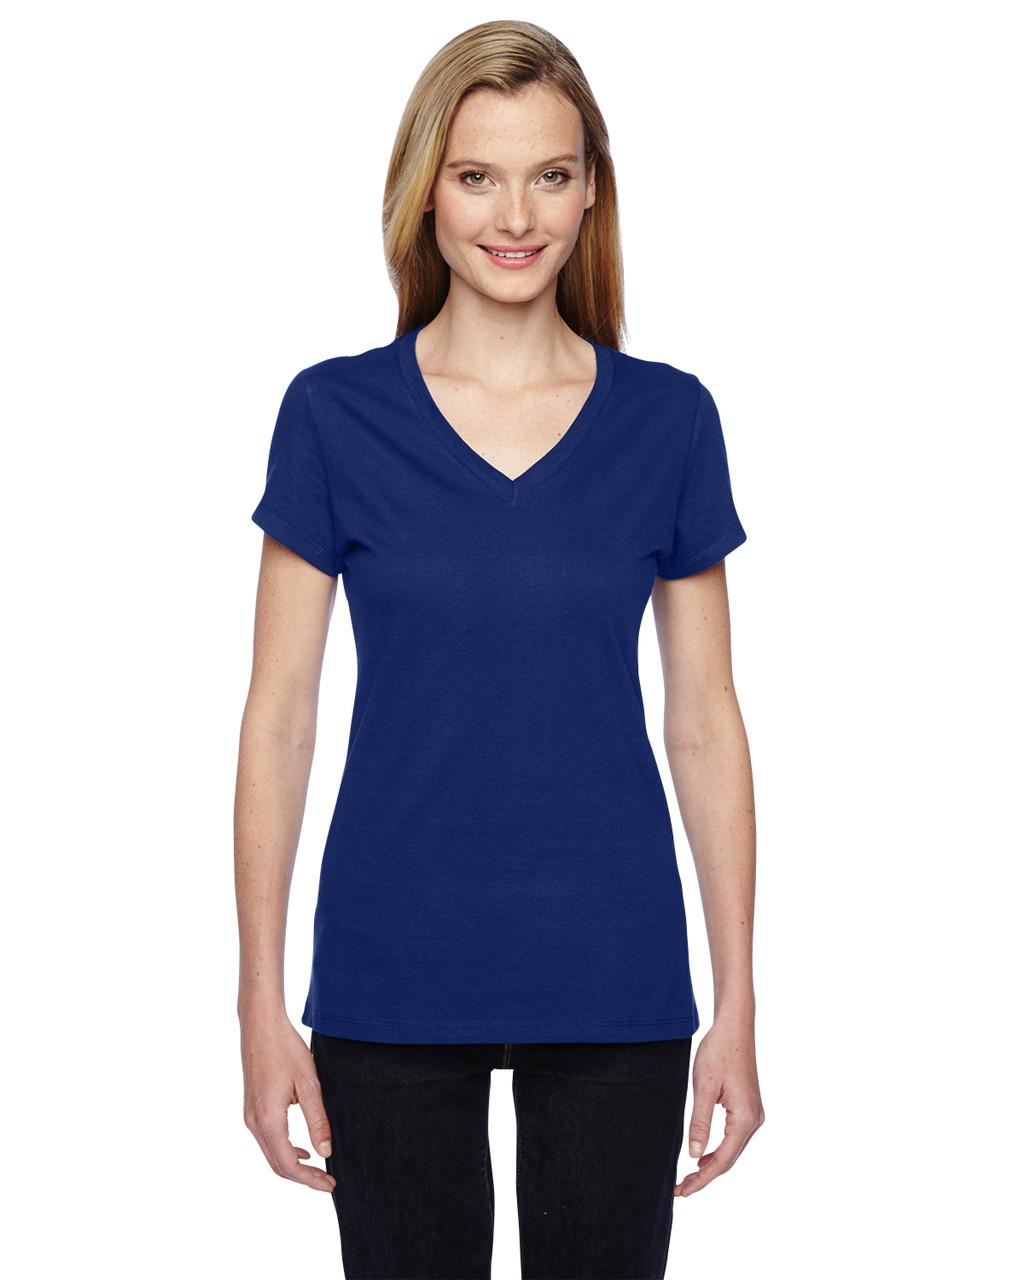 100/% Sofspun Cotton Jersey Crew T-Shirt SF45R L Fruit of the Loom 4.7 oz Charcoal Grey